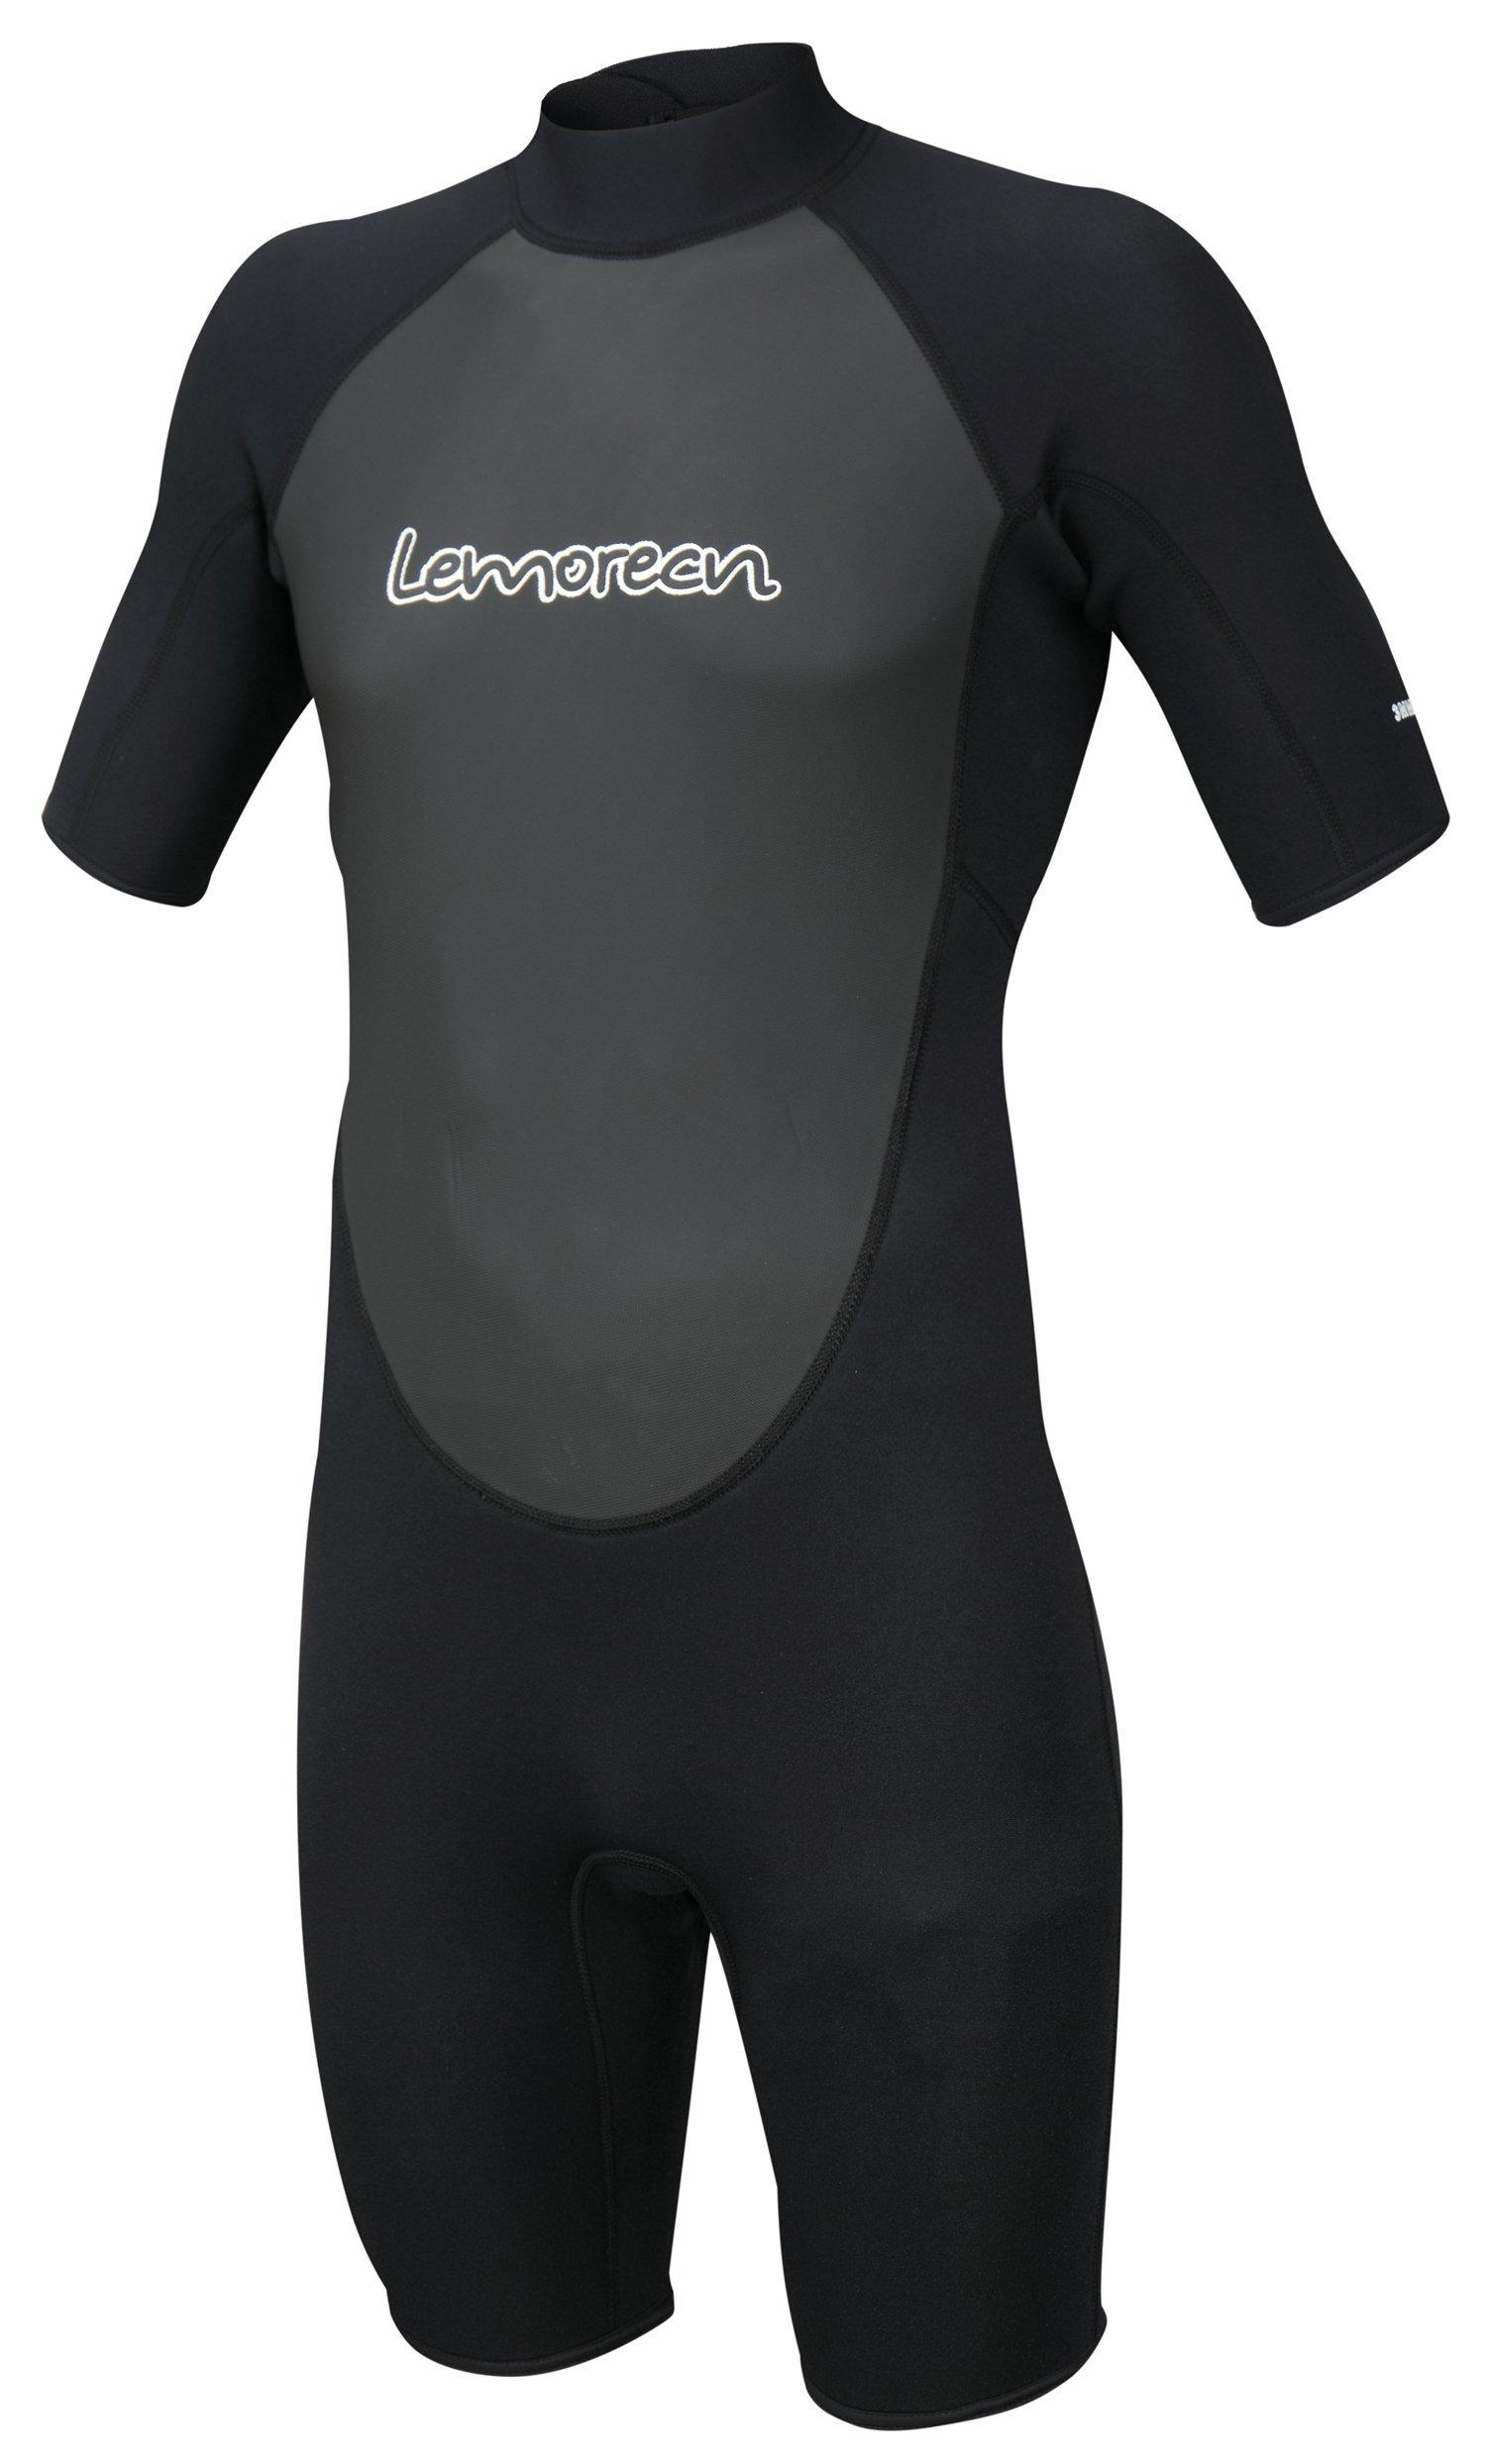 Lemorecn Wetsuits Mens Neoprene 3mm Shorty Diving Suit(3036black-3XL) by Lemorecn (Image #1)